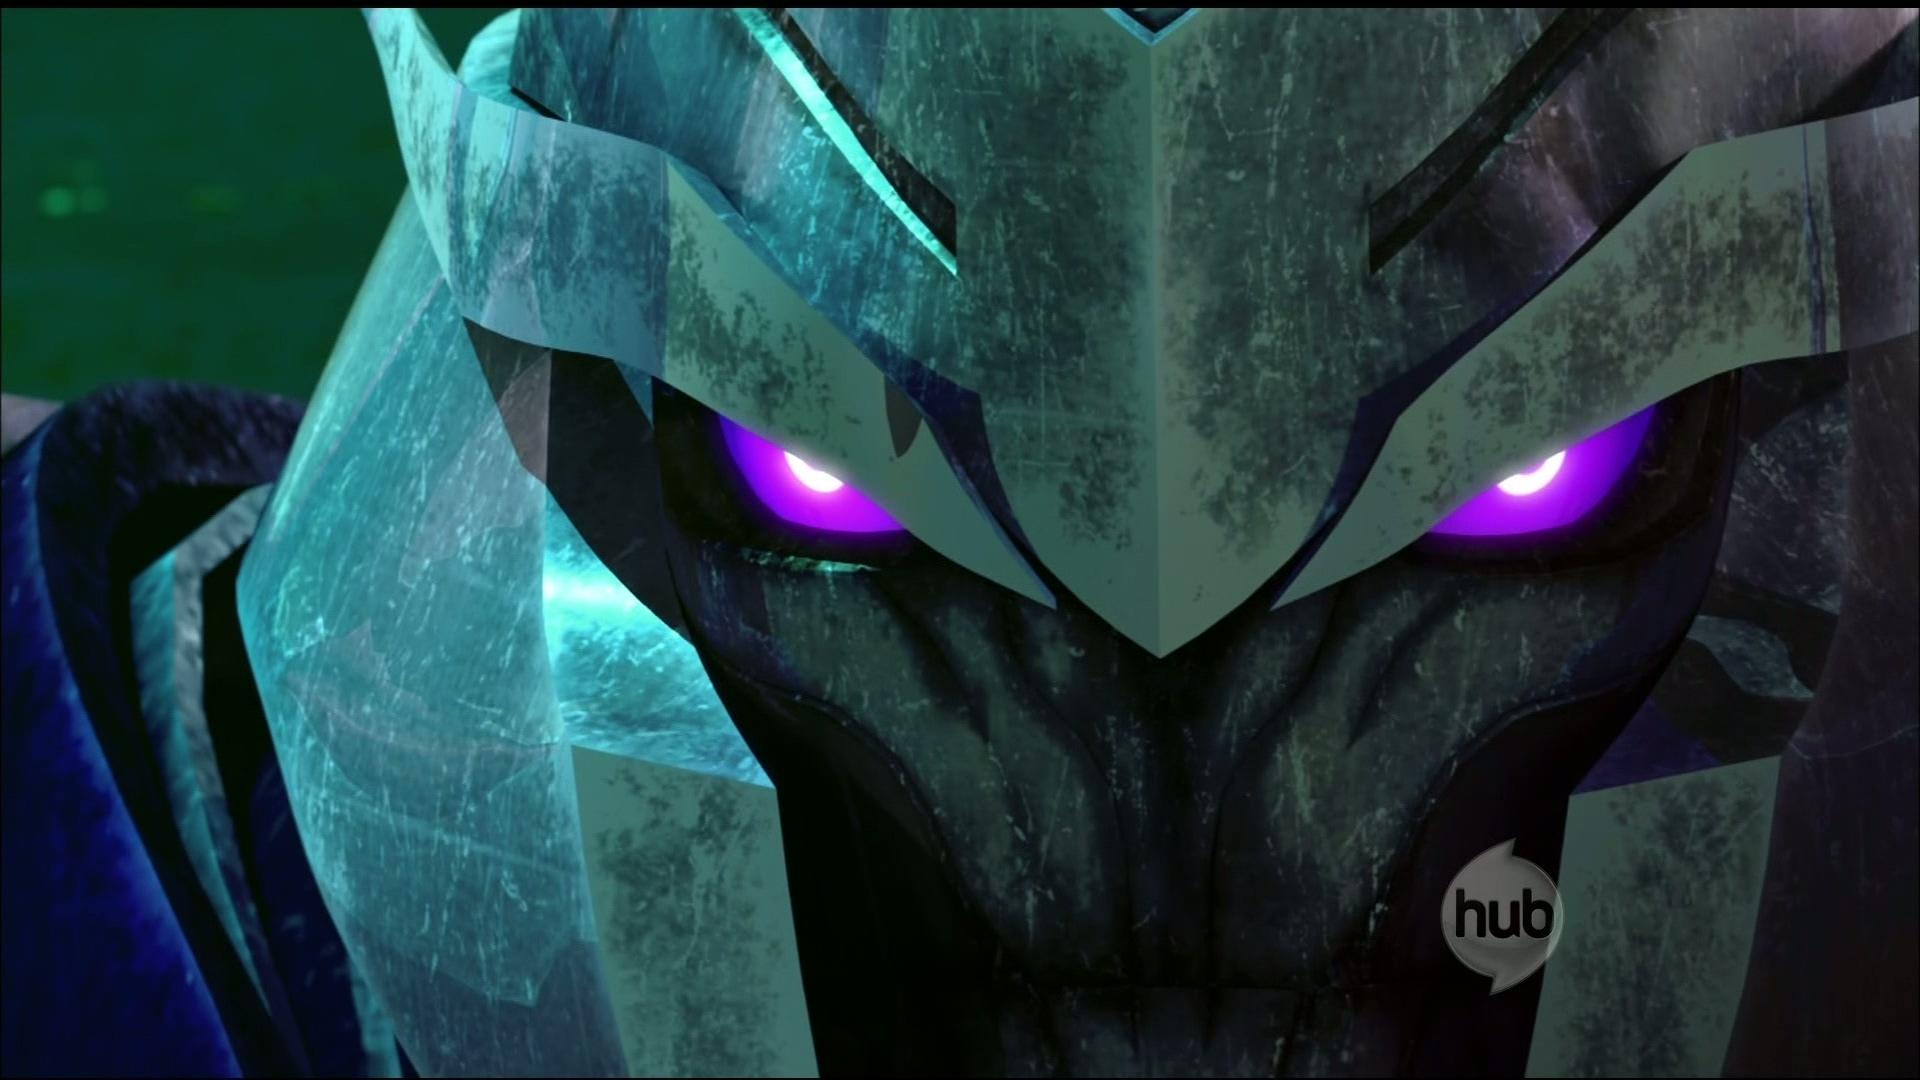 July 2013 page 2 - Transformers prime megatron ...